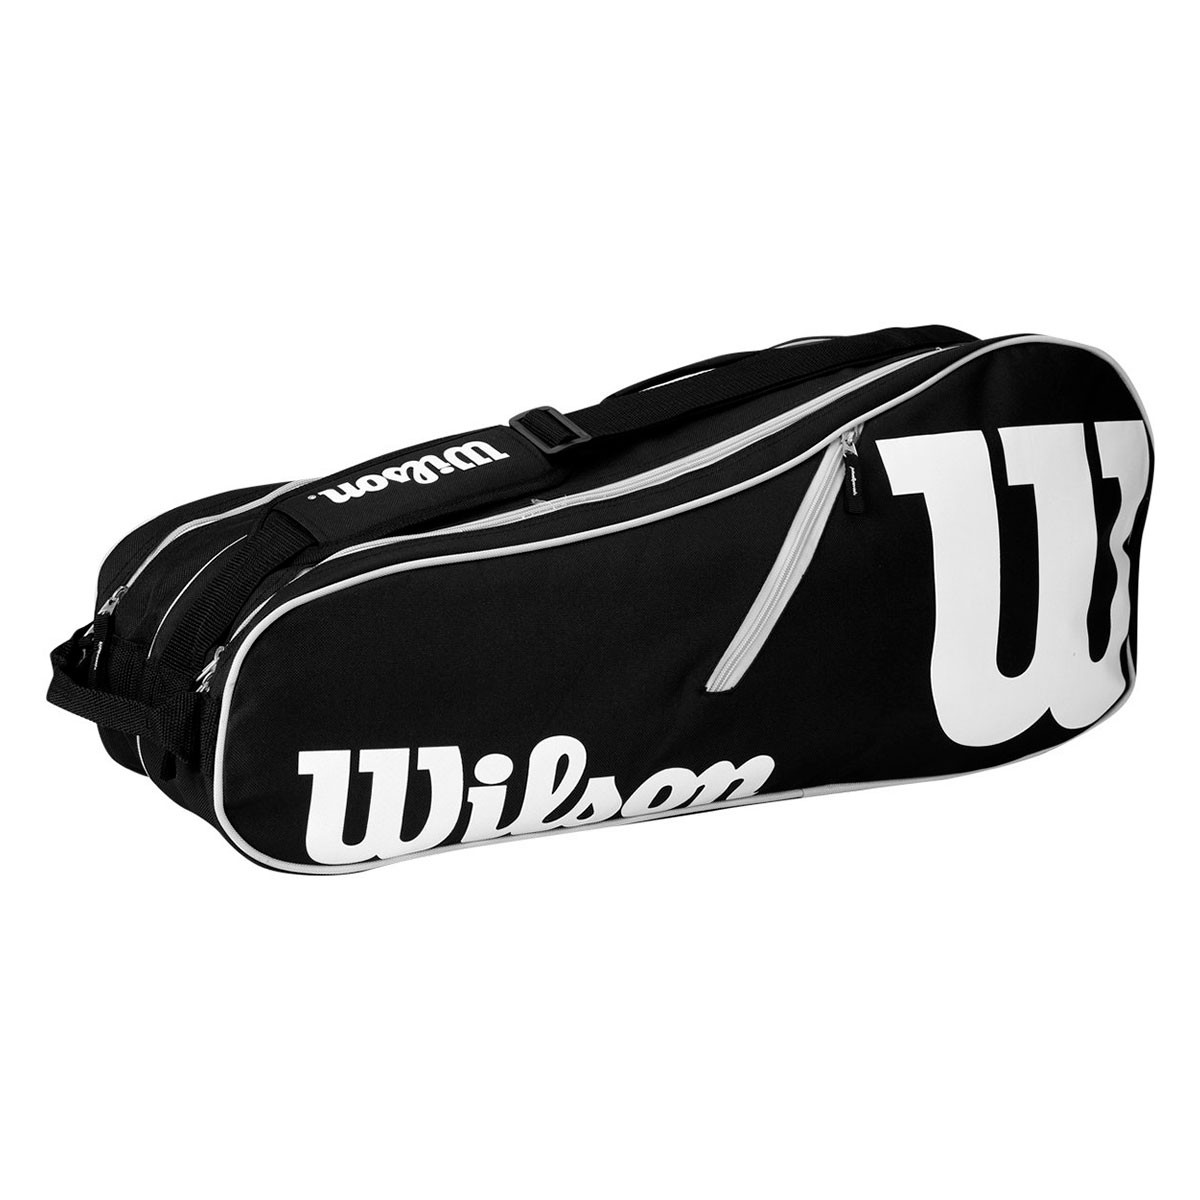 Bolsa Esportiva Wilson Advantage II 6 Pack Preto